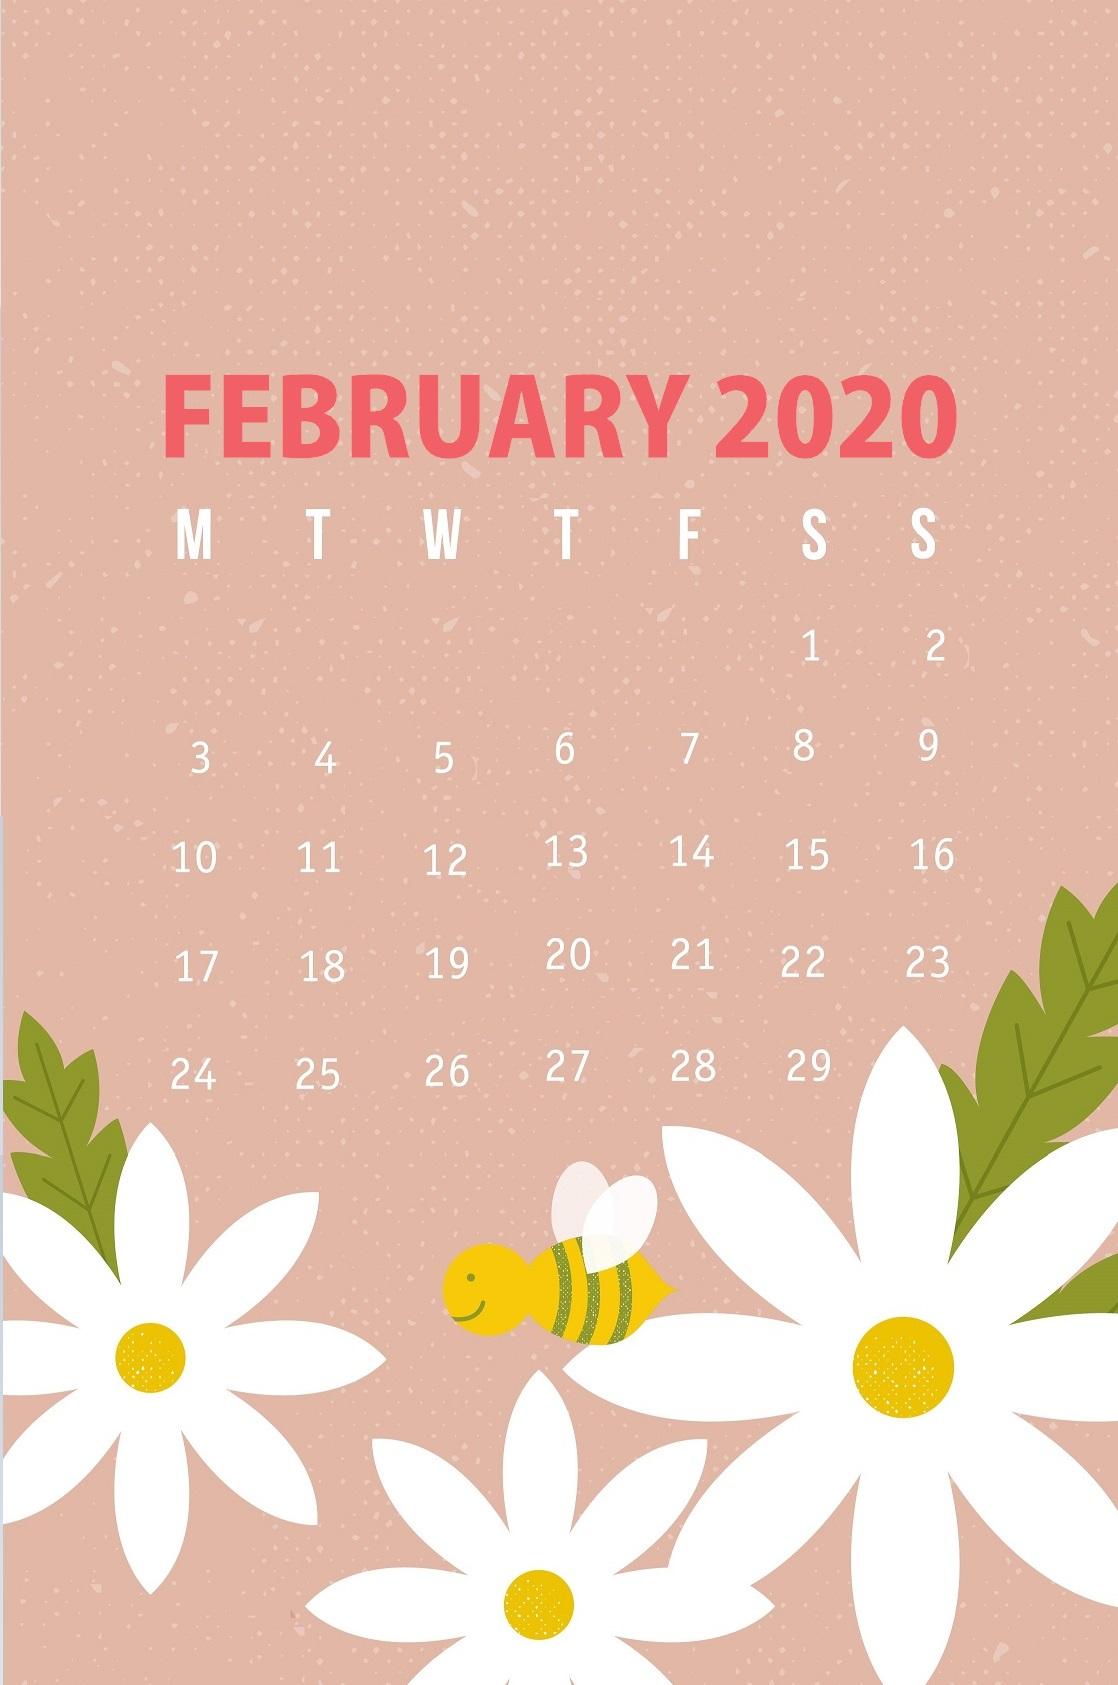 February 2020 iPhone Background